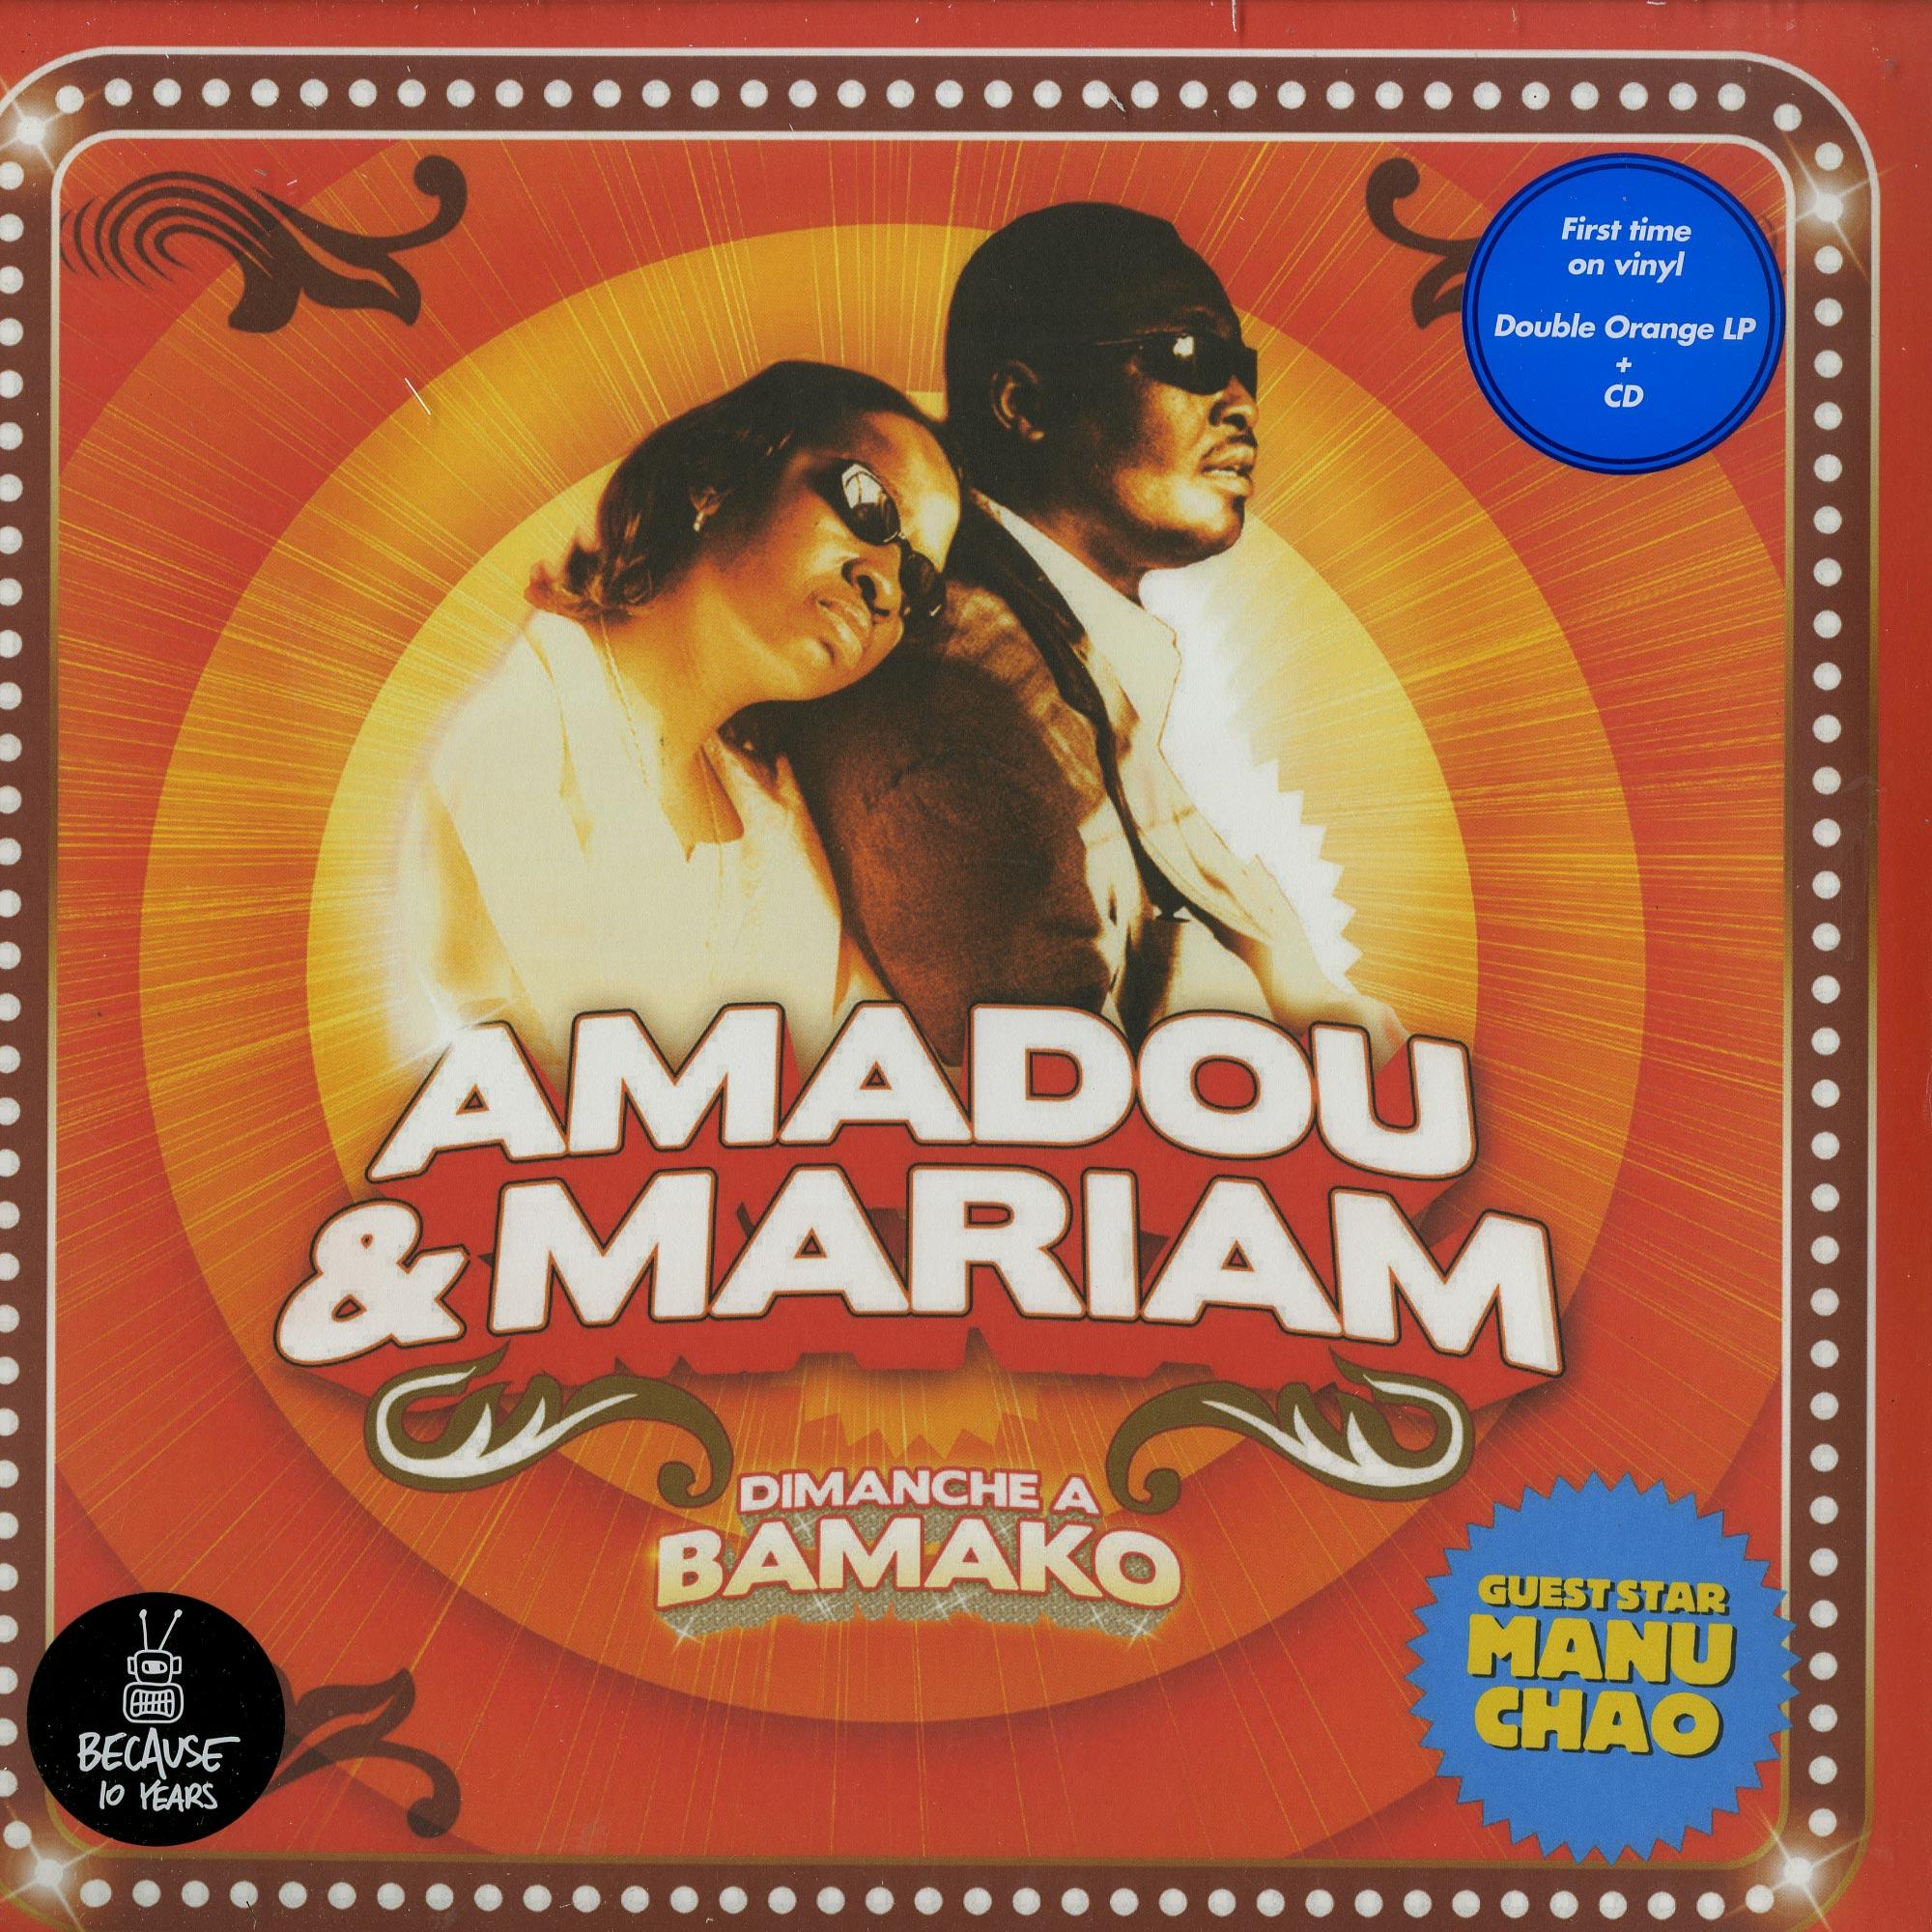 Amadou & Mariam - IMANCHE A BAMAKO